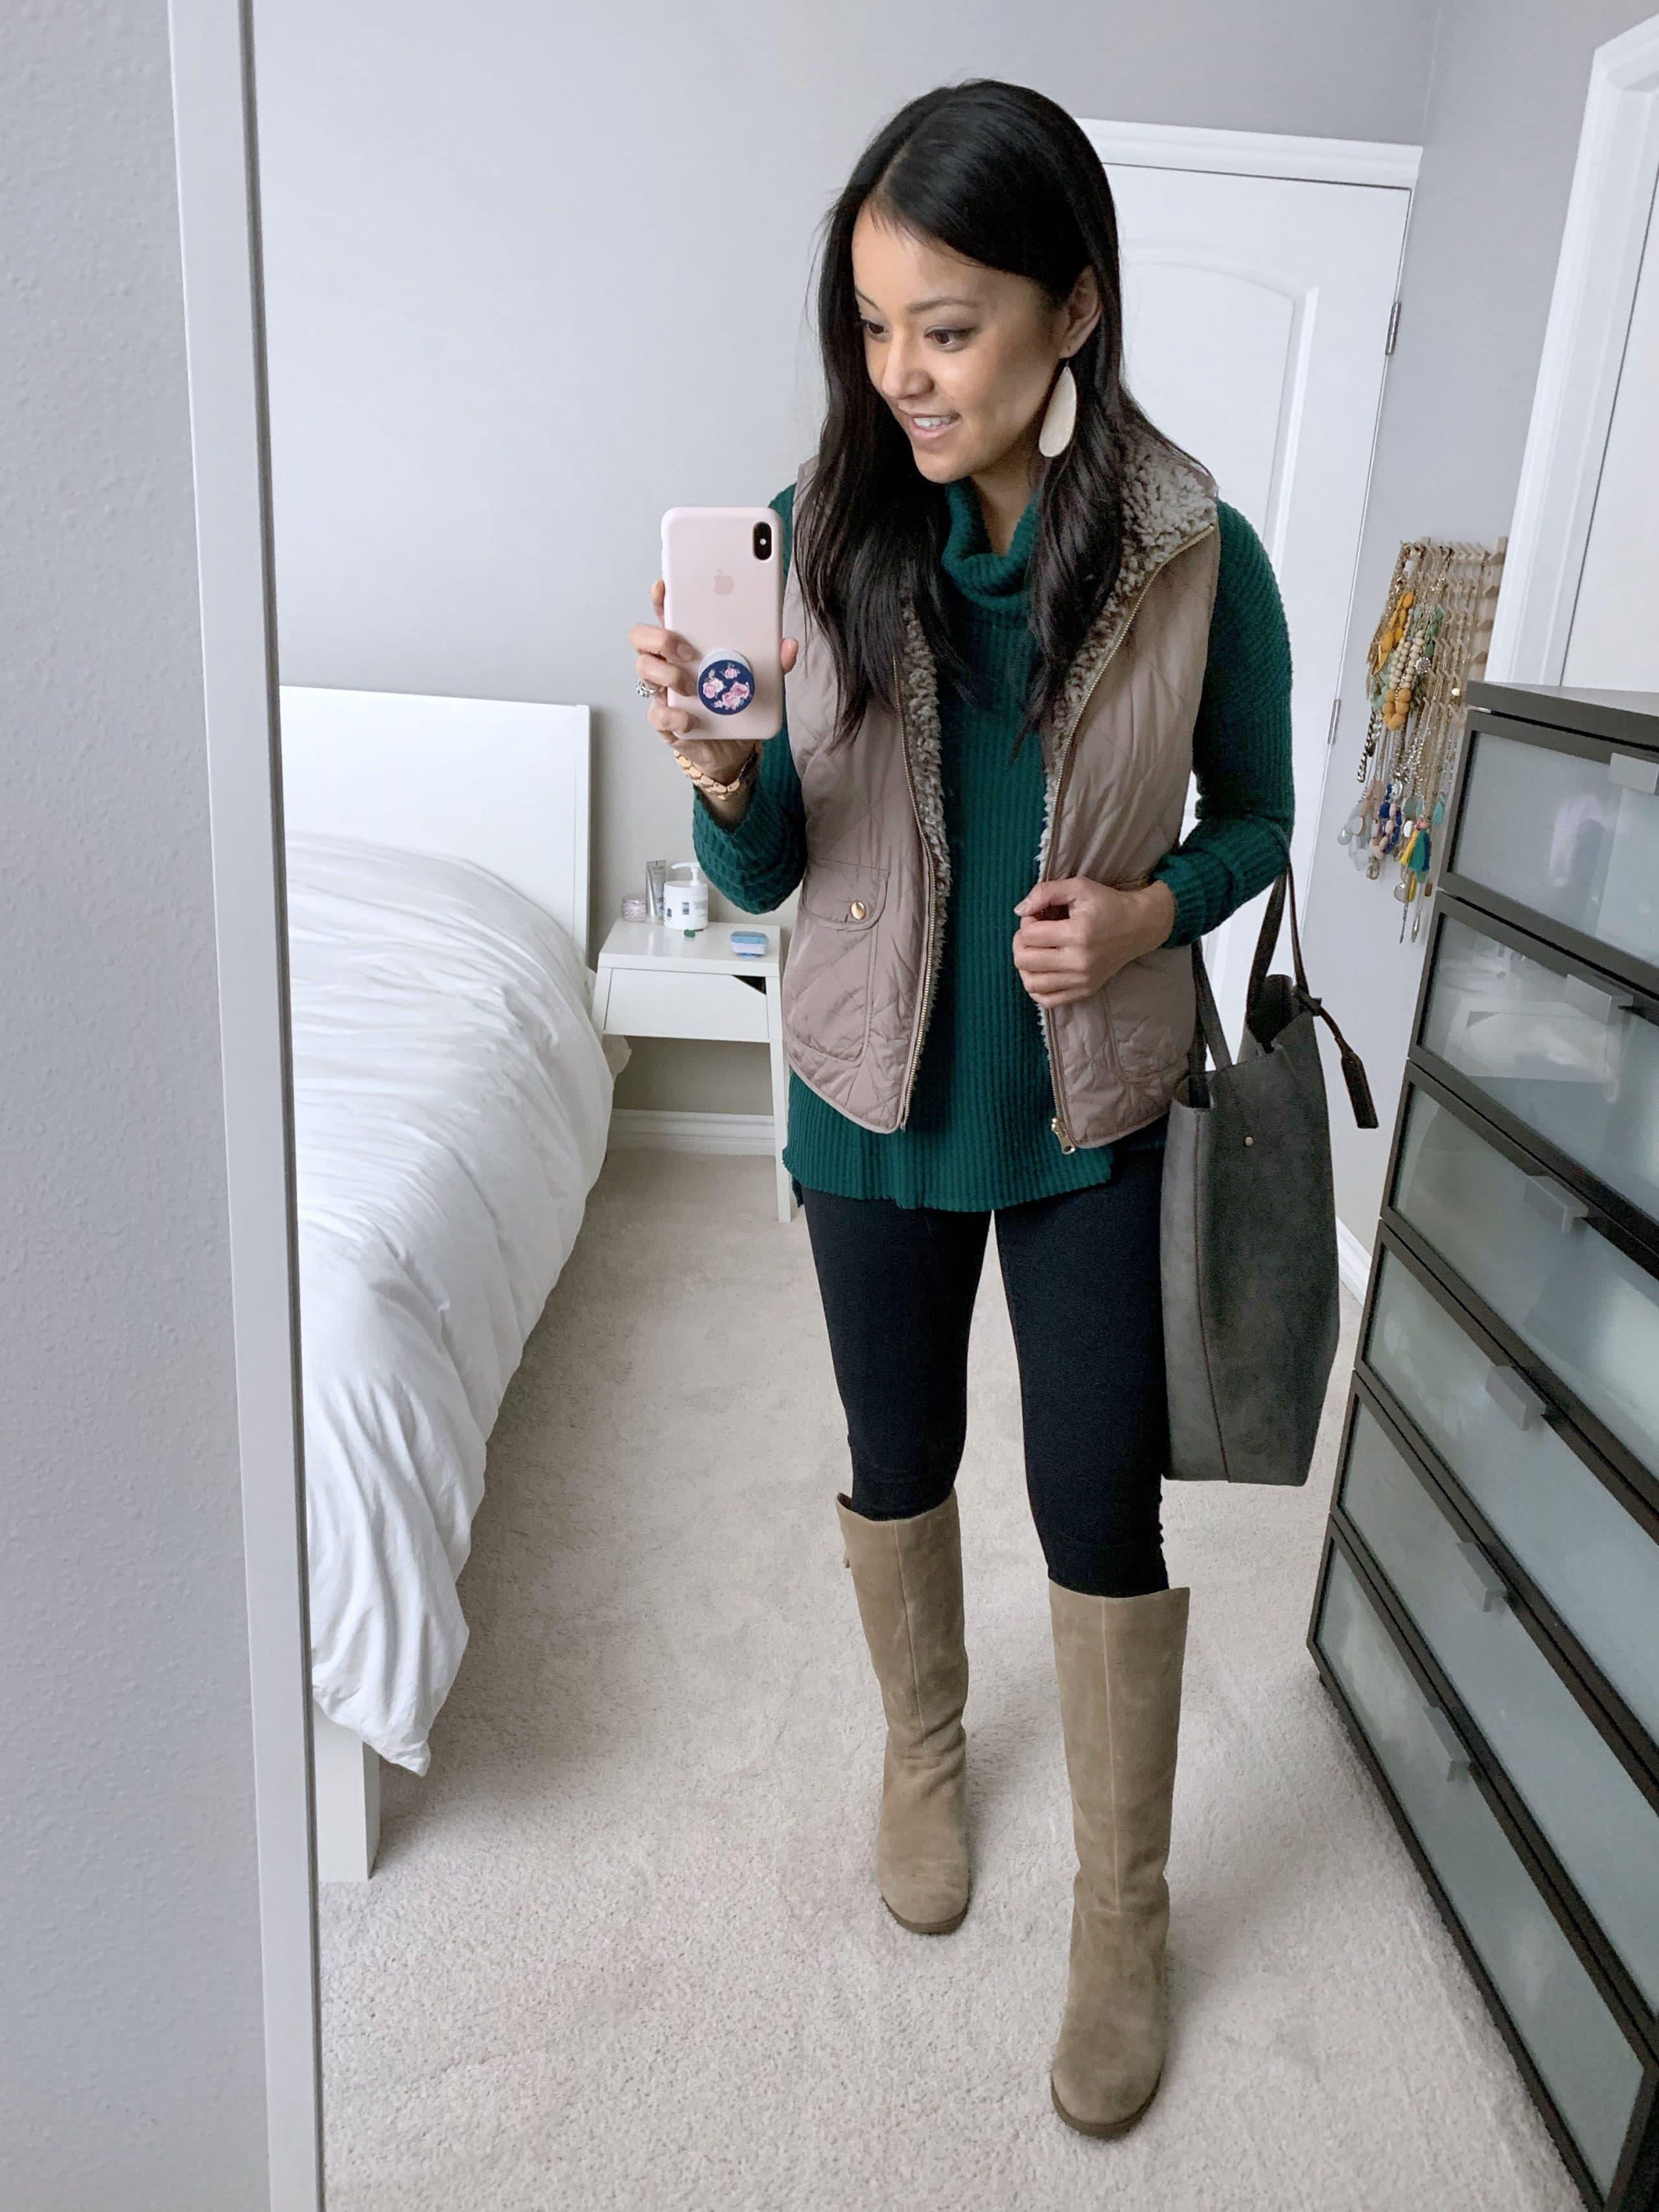 Vest + Green Turtleneck + Boots + leggings + tote